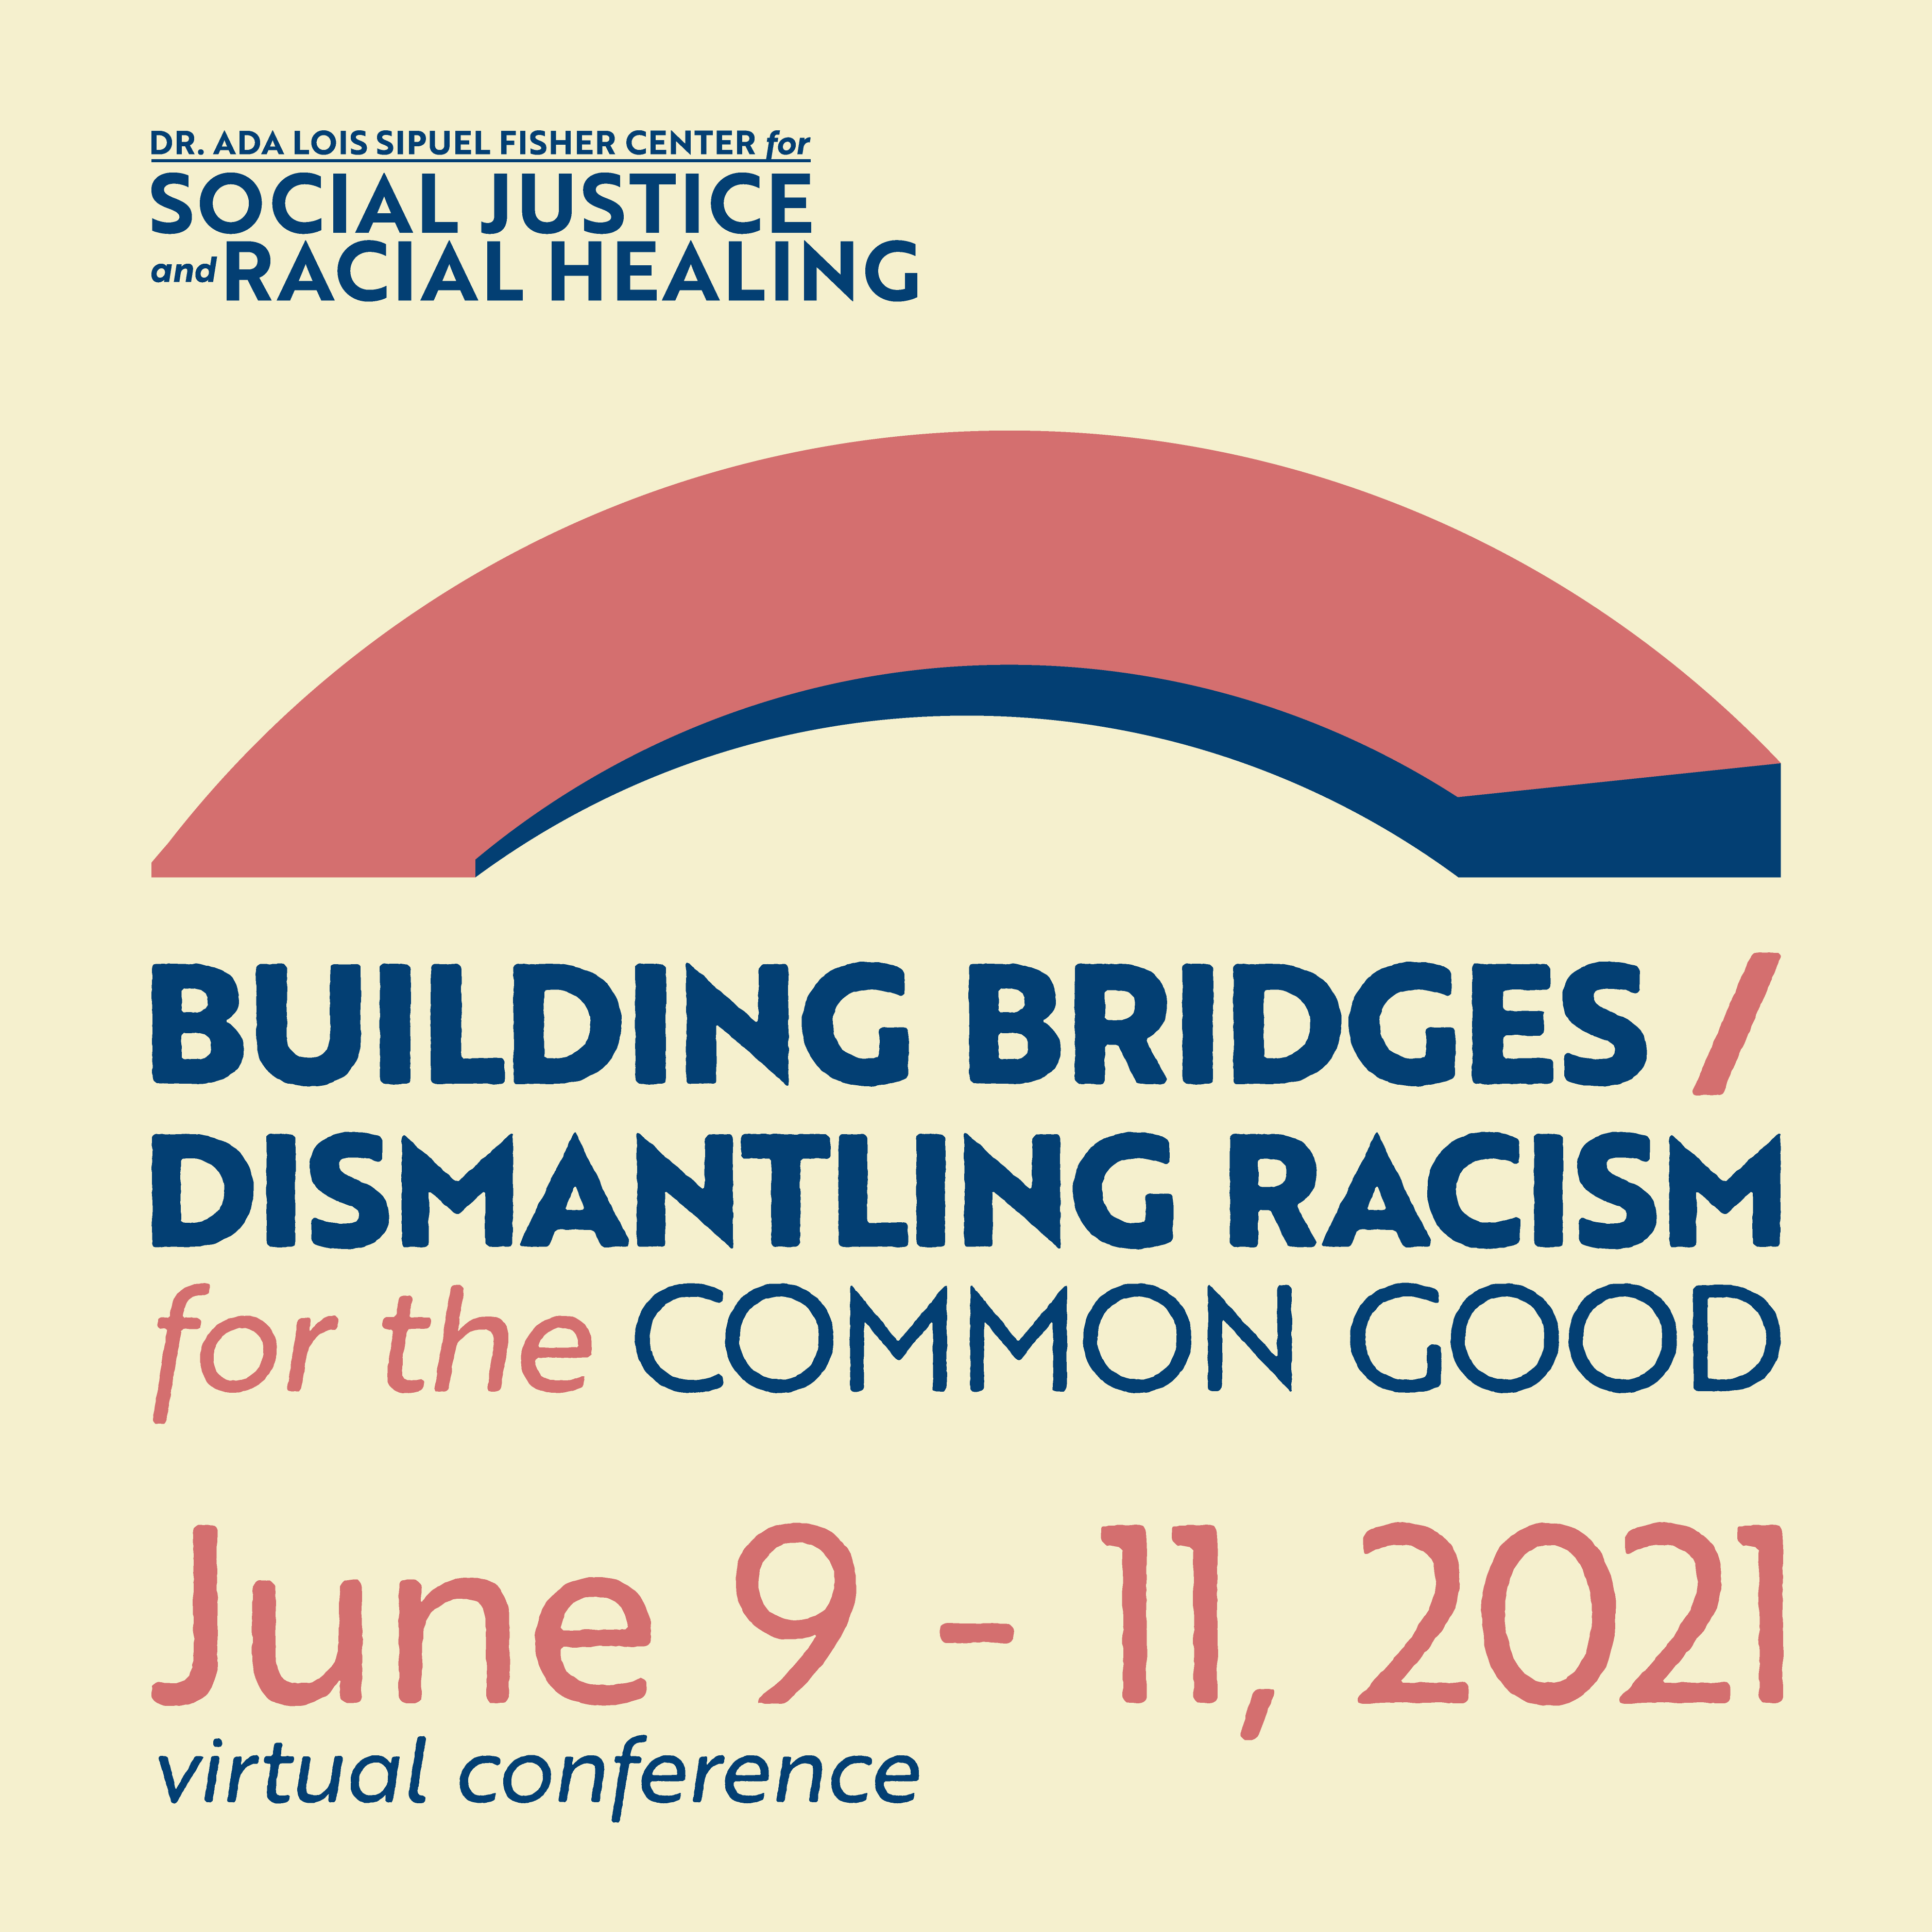 Building Bridges-Dismantling Racism Conference June 9 - 11 2021